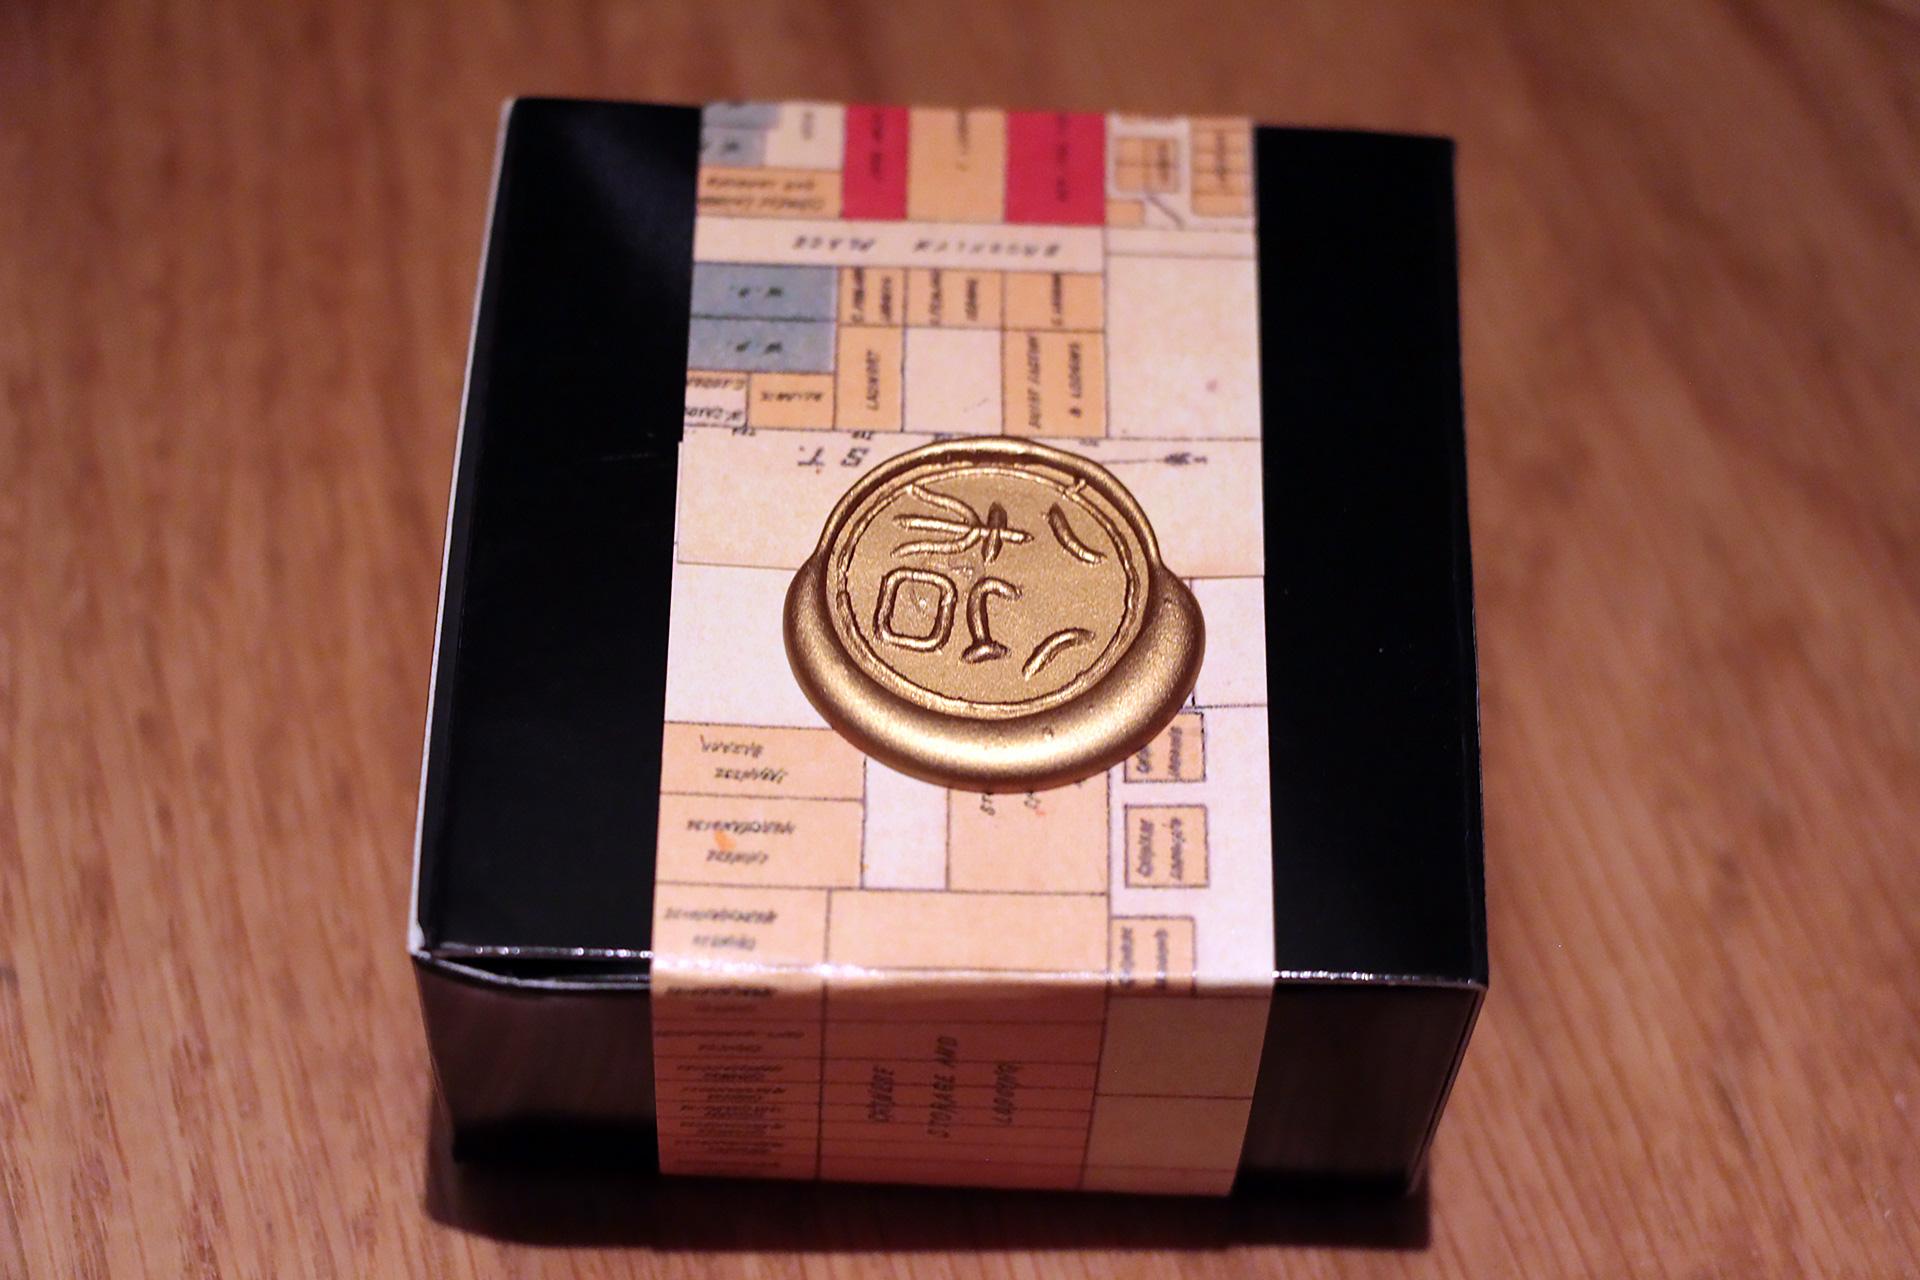 Microbatch bonbons by Oakland chocolatier Karen Urbanek